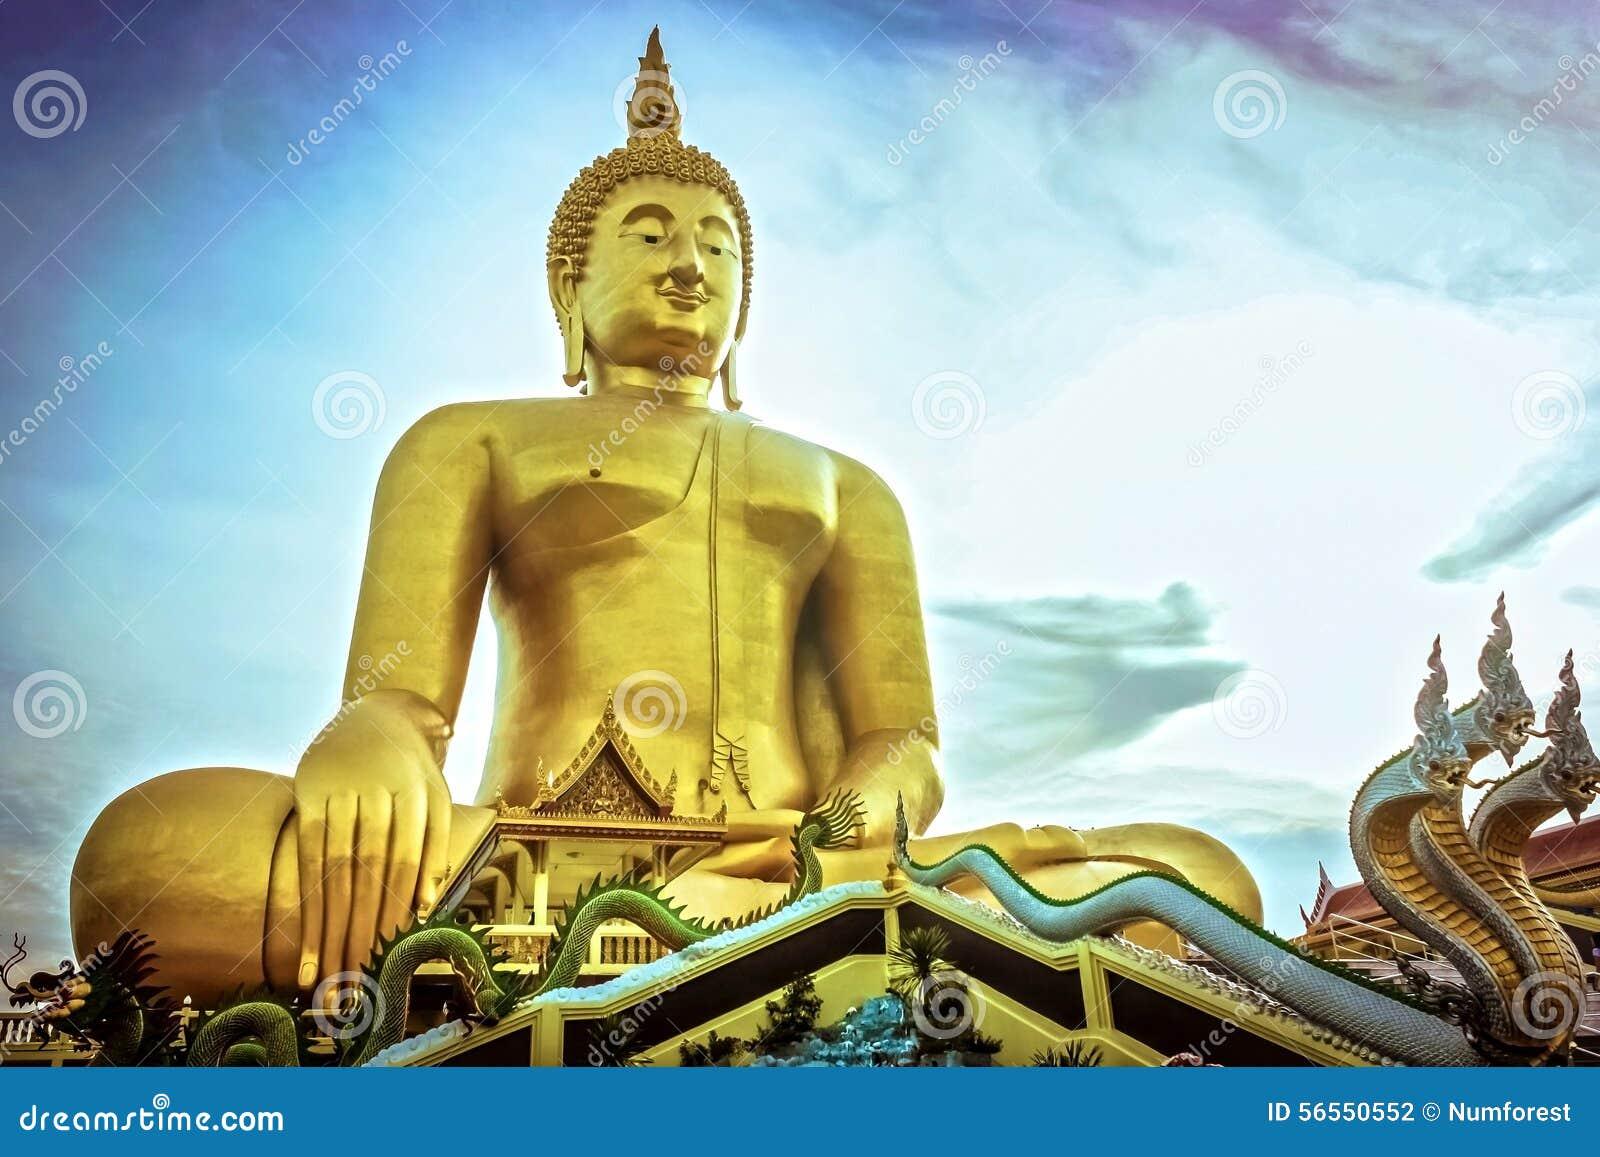 Download χρυσό άγαλμα του Βούδα στοκ εικόνες. εικόνα από ασία - 56550552